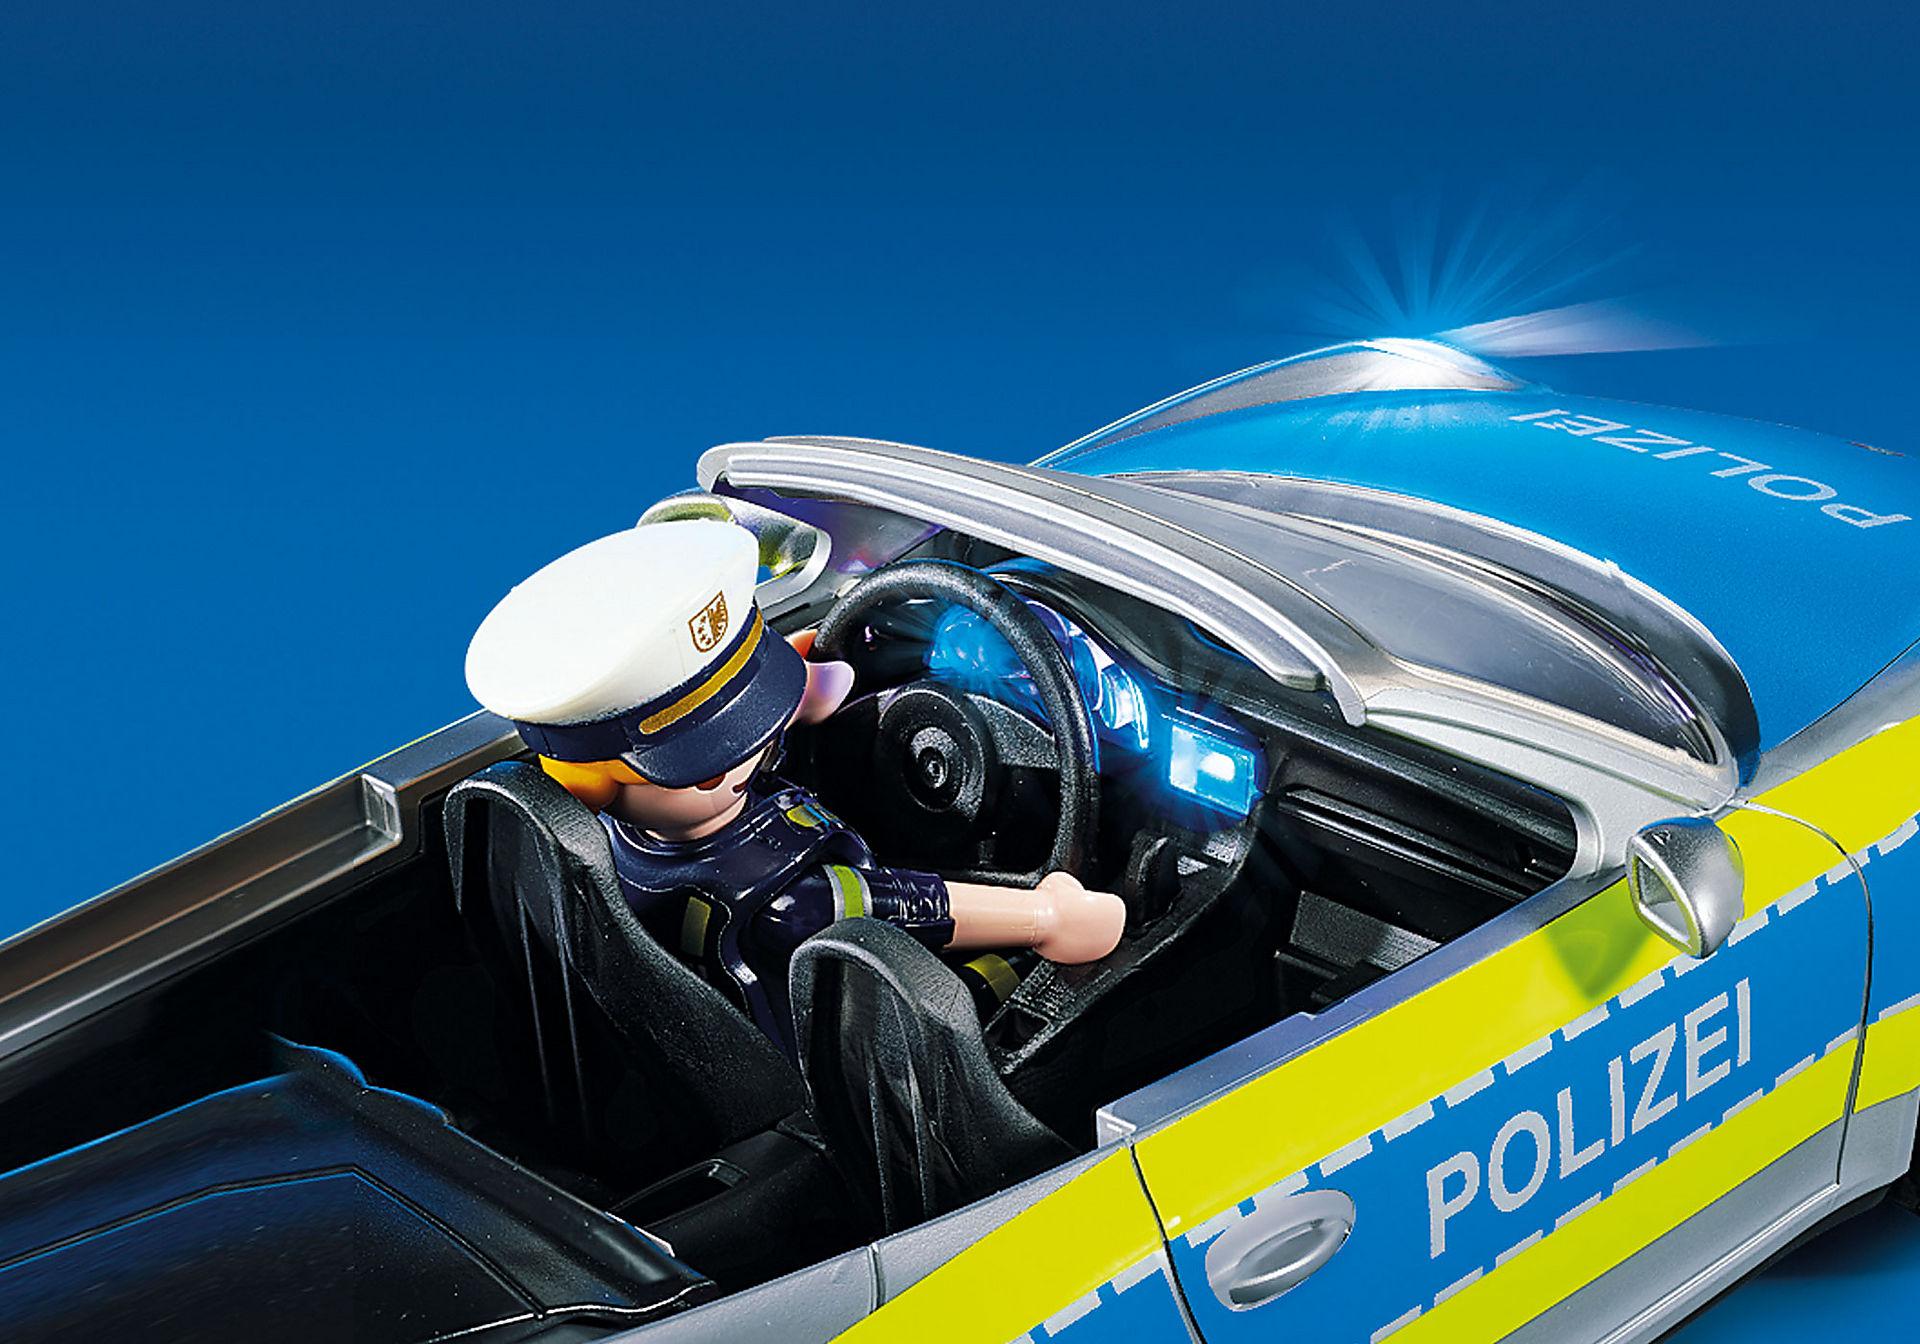 70067 Porsche 911 Carrera 4S Polizei zoom image8